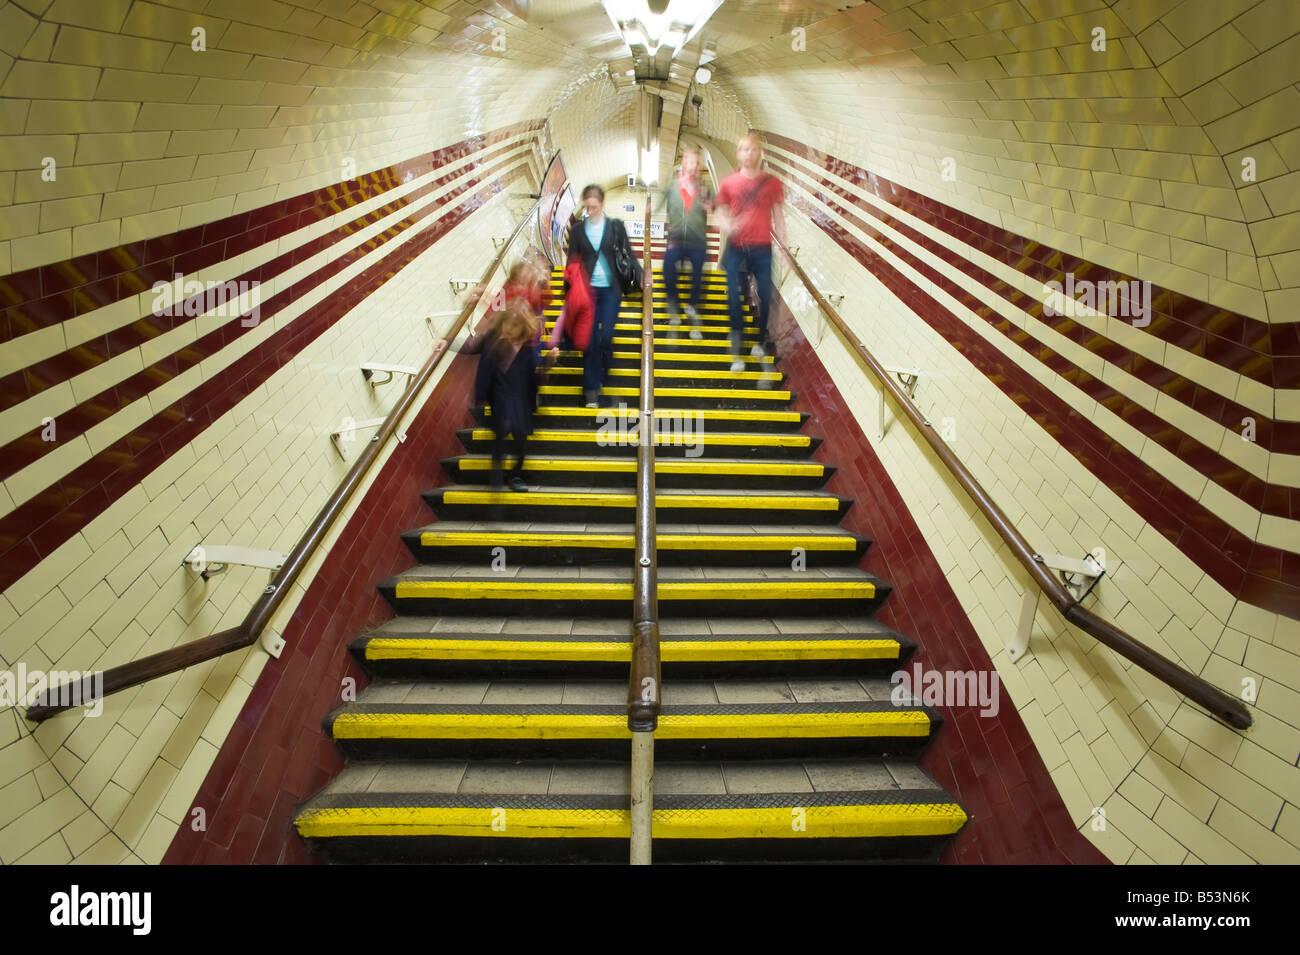 Interior of Hampstead Underground Station London United Kingdom - Stock Image